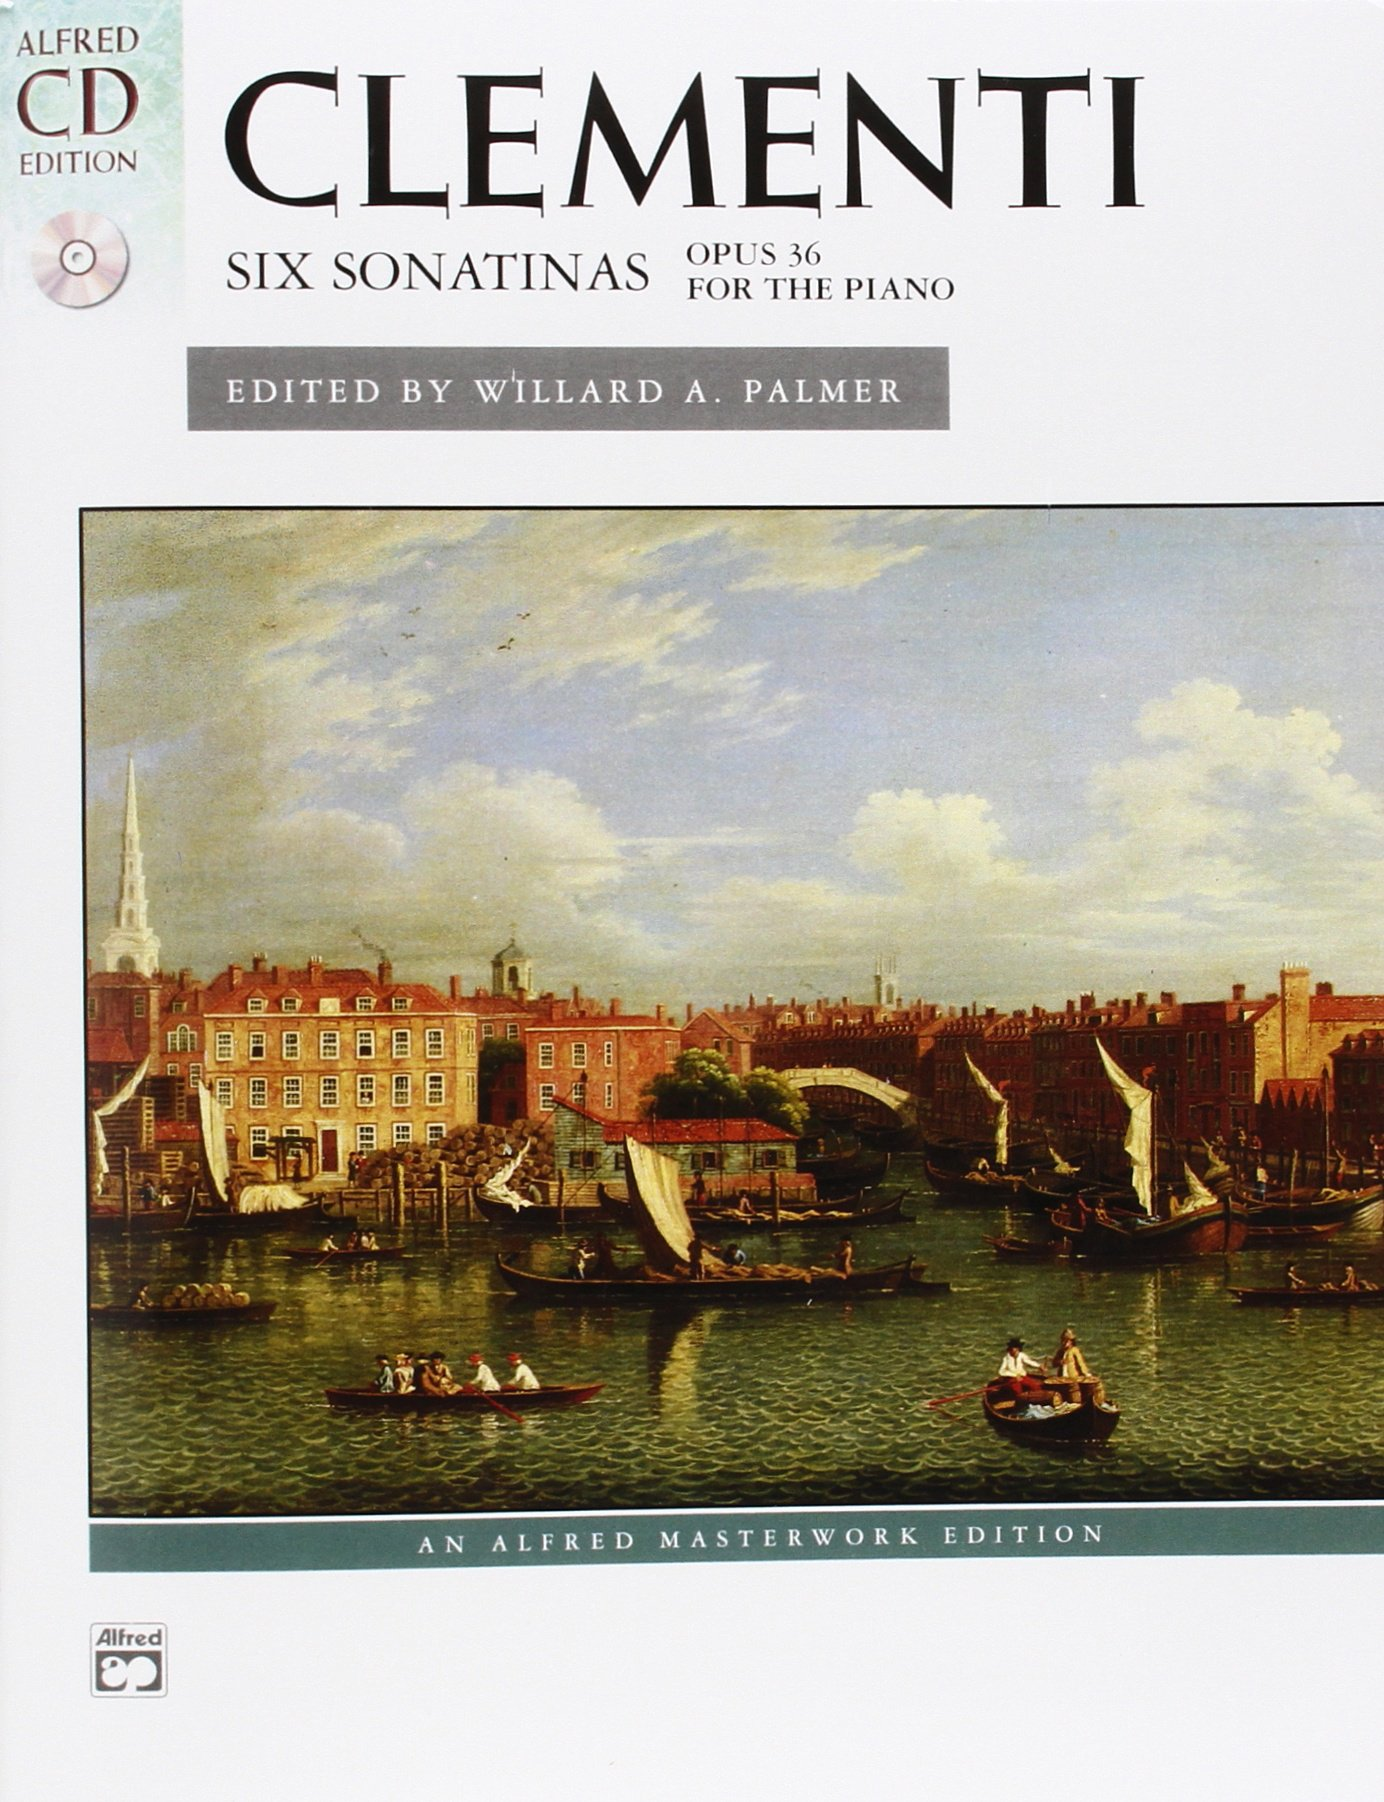 Clementi -- Six Sonatinas, Op. 36: Book & CD (Alfred Masterwork CD Edition)